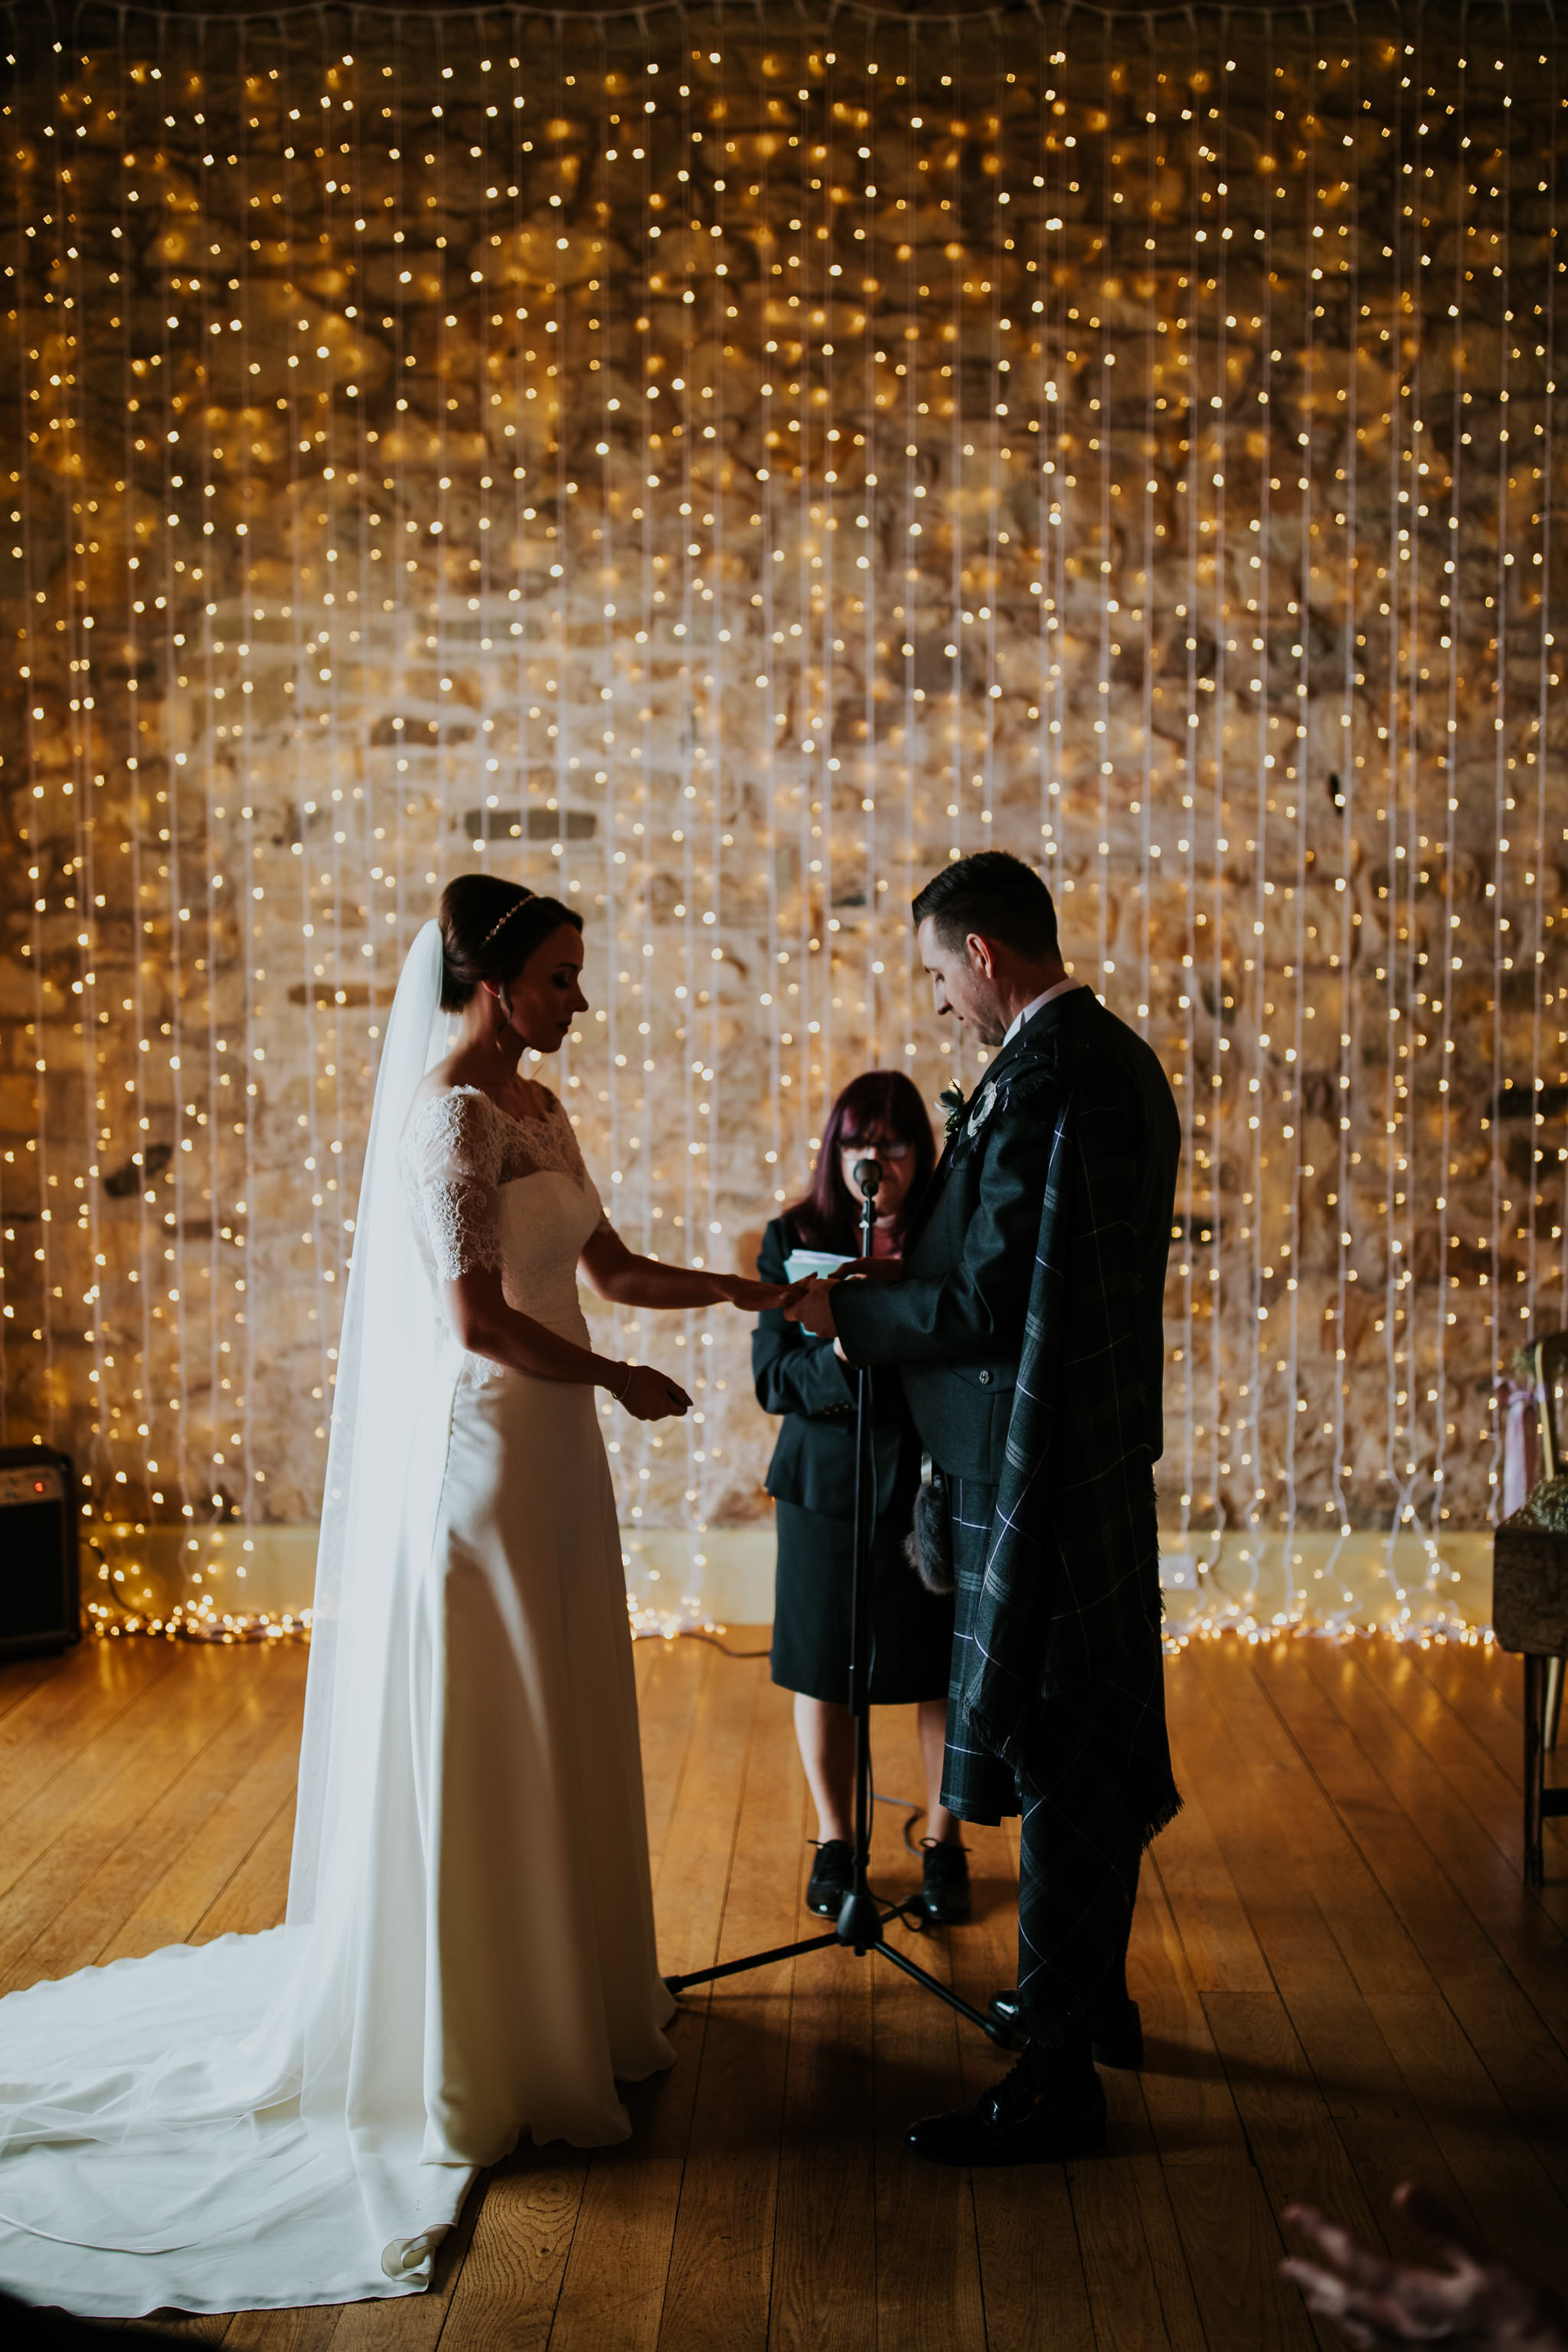 kirknewton stables wedding photographer (39).jpg